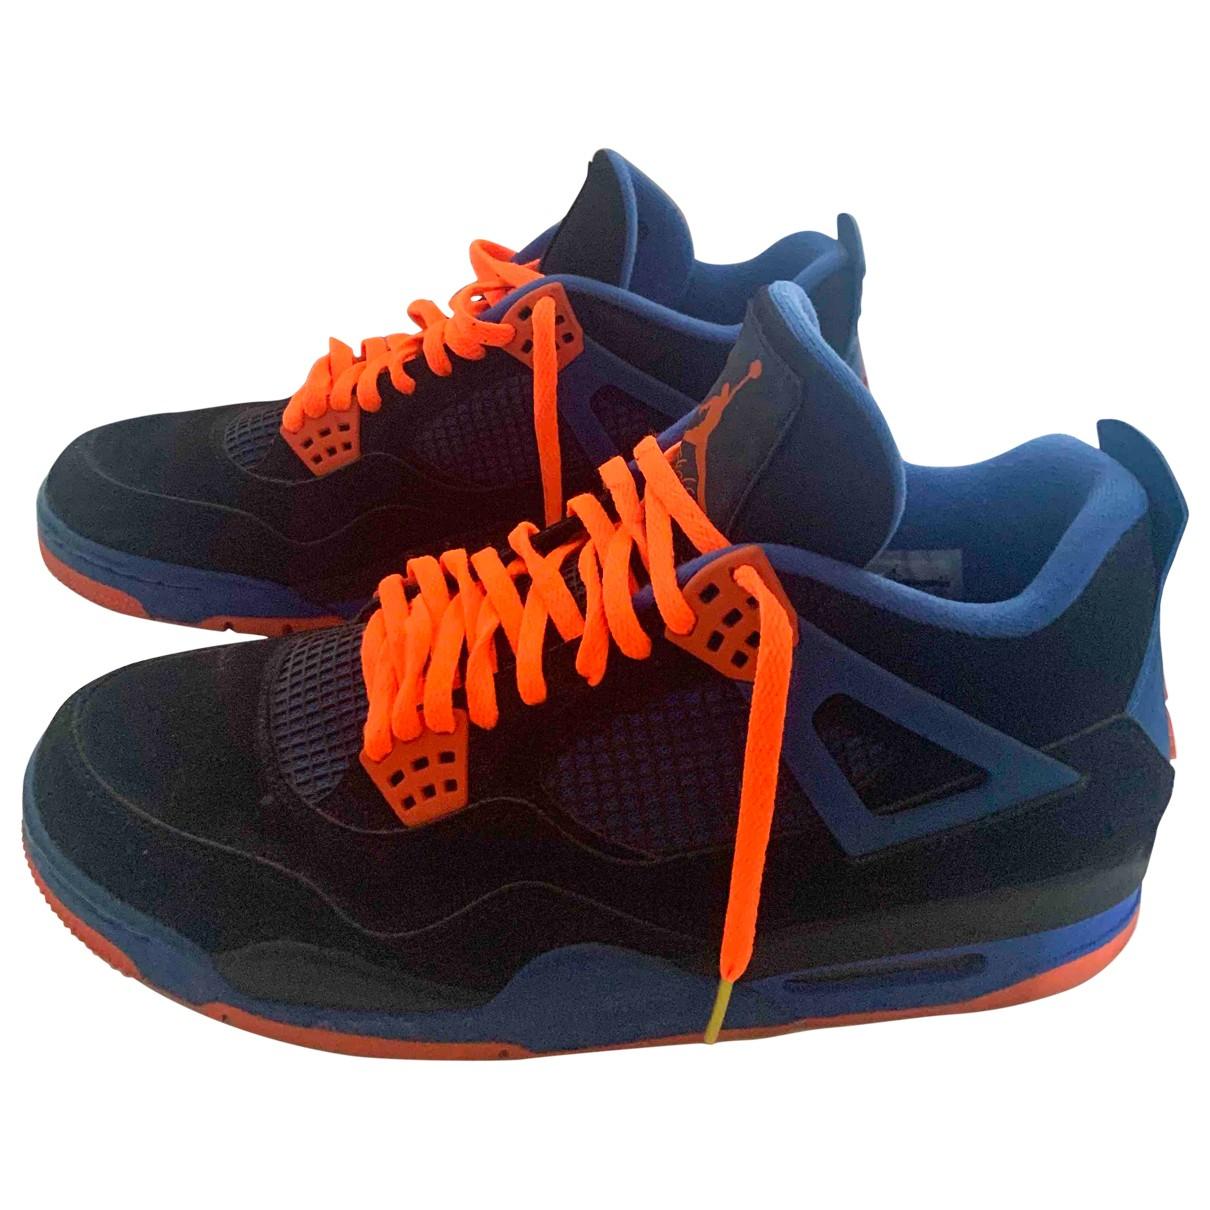 Jordan Air Jordan 4 Sneakers in  Blau Leinen